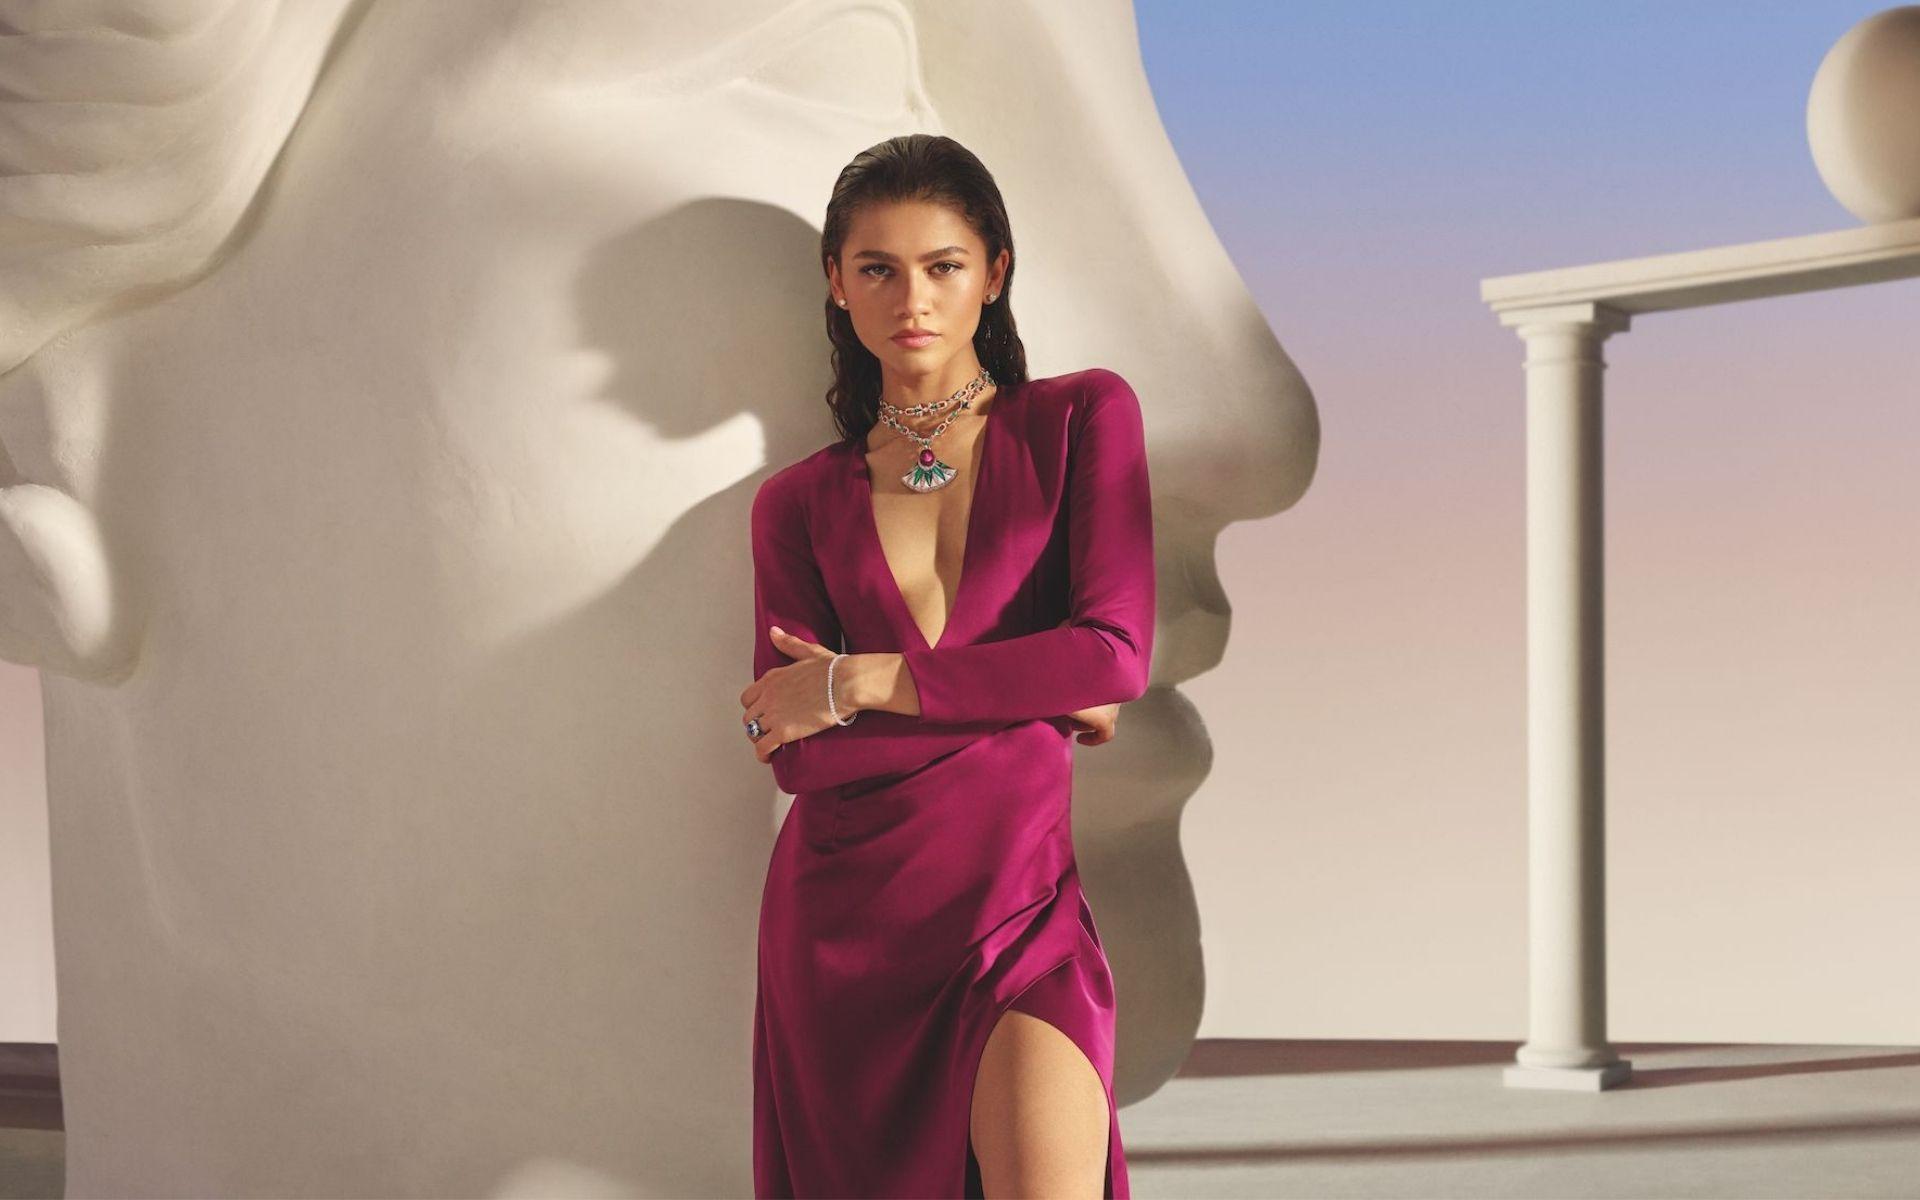 Bulgari's Lucia Silvestri Breaks Down Her Favourite Magnifica High Jewellery Pieces